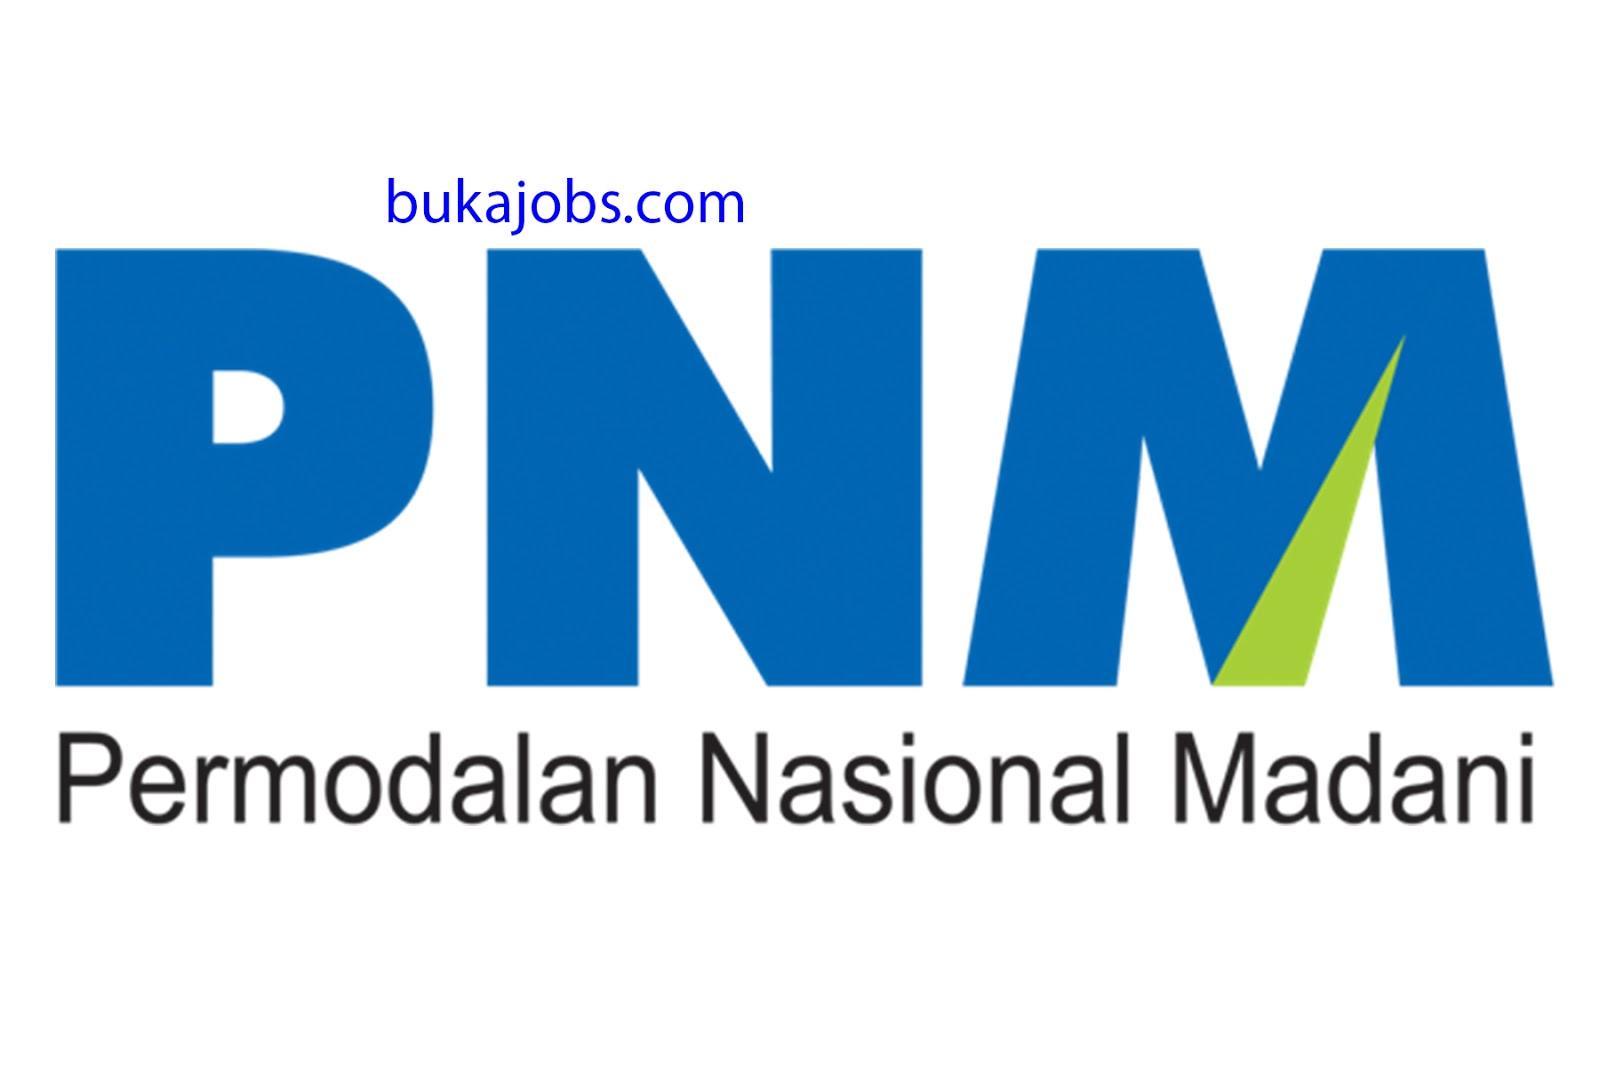 Lowongan Kerja PT Permodalan Nasional Madani (BUMN)